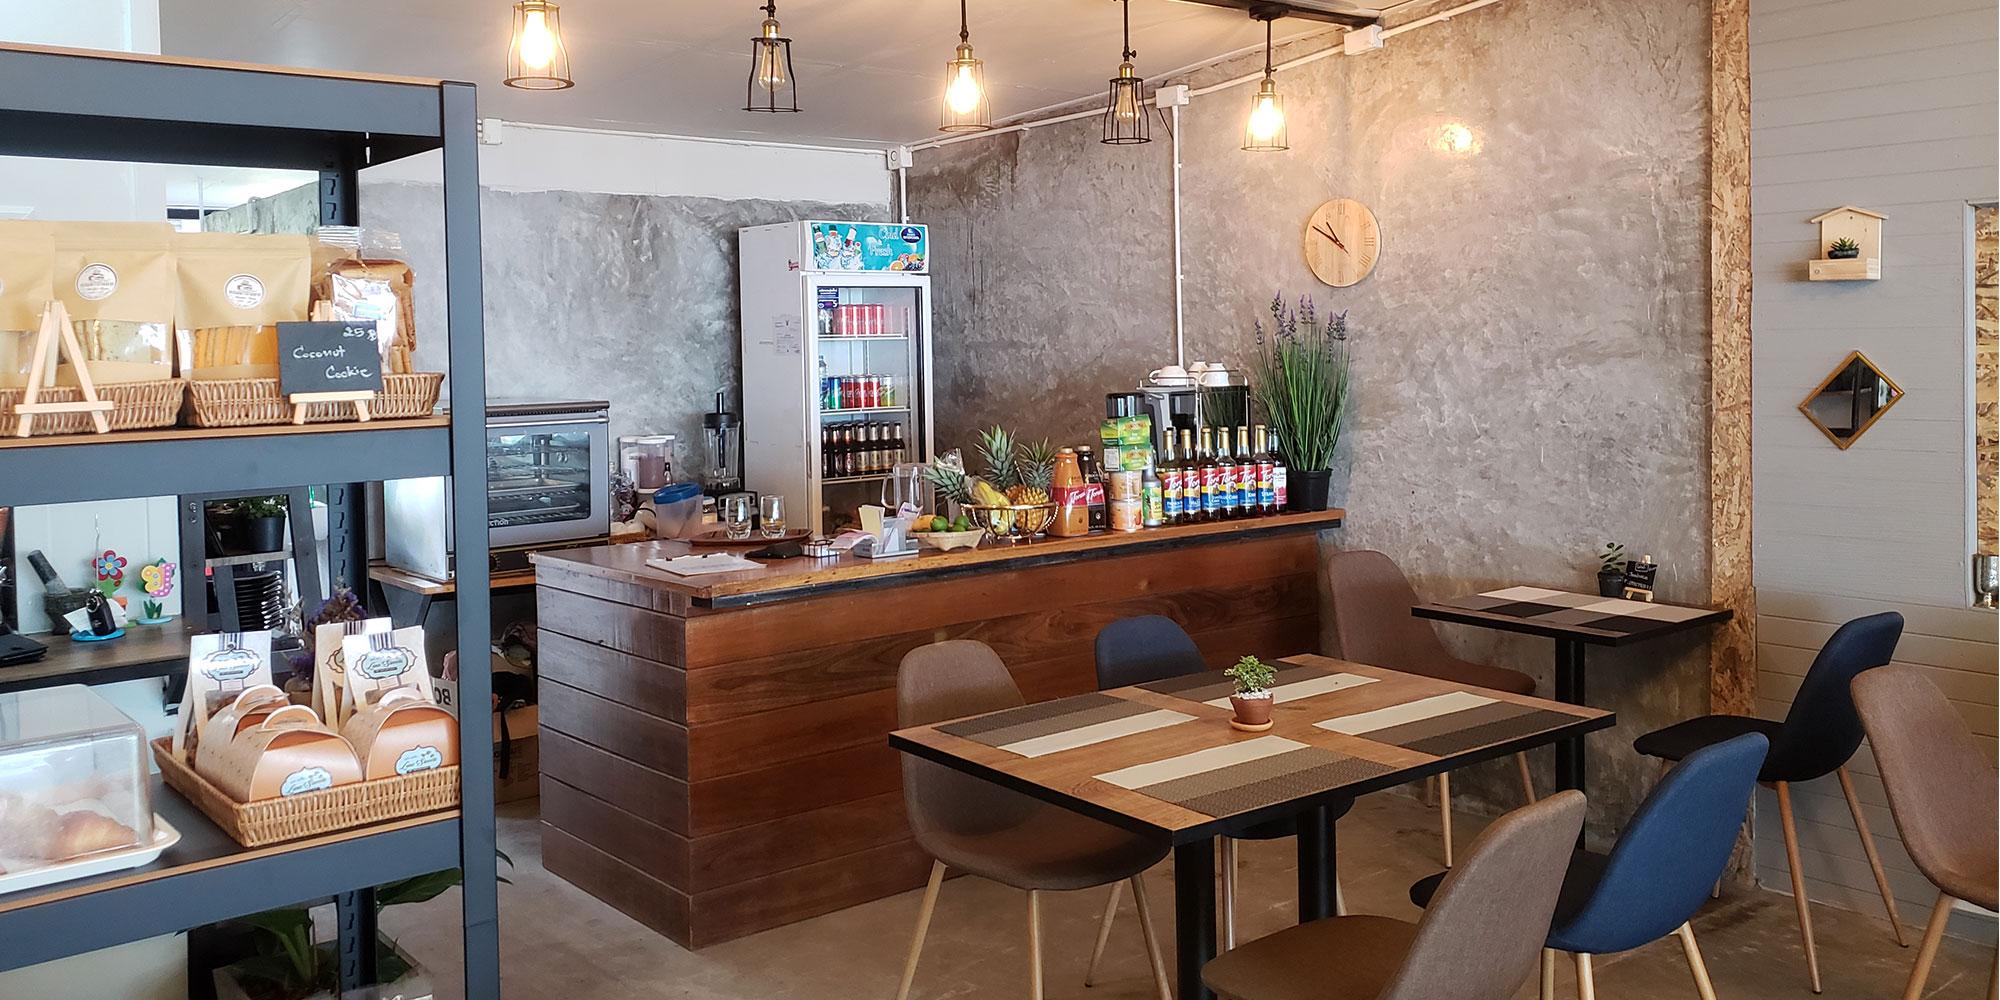 SeaBreeze Cafe & Bistro | Ao Nang | Krabi | Thailand